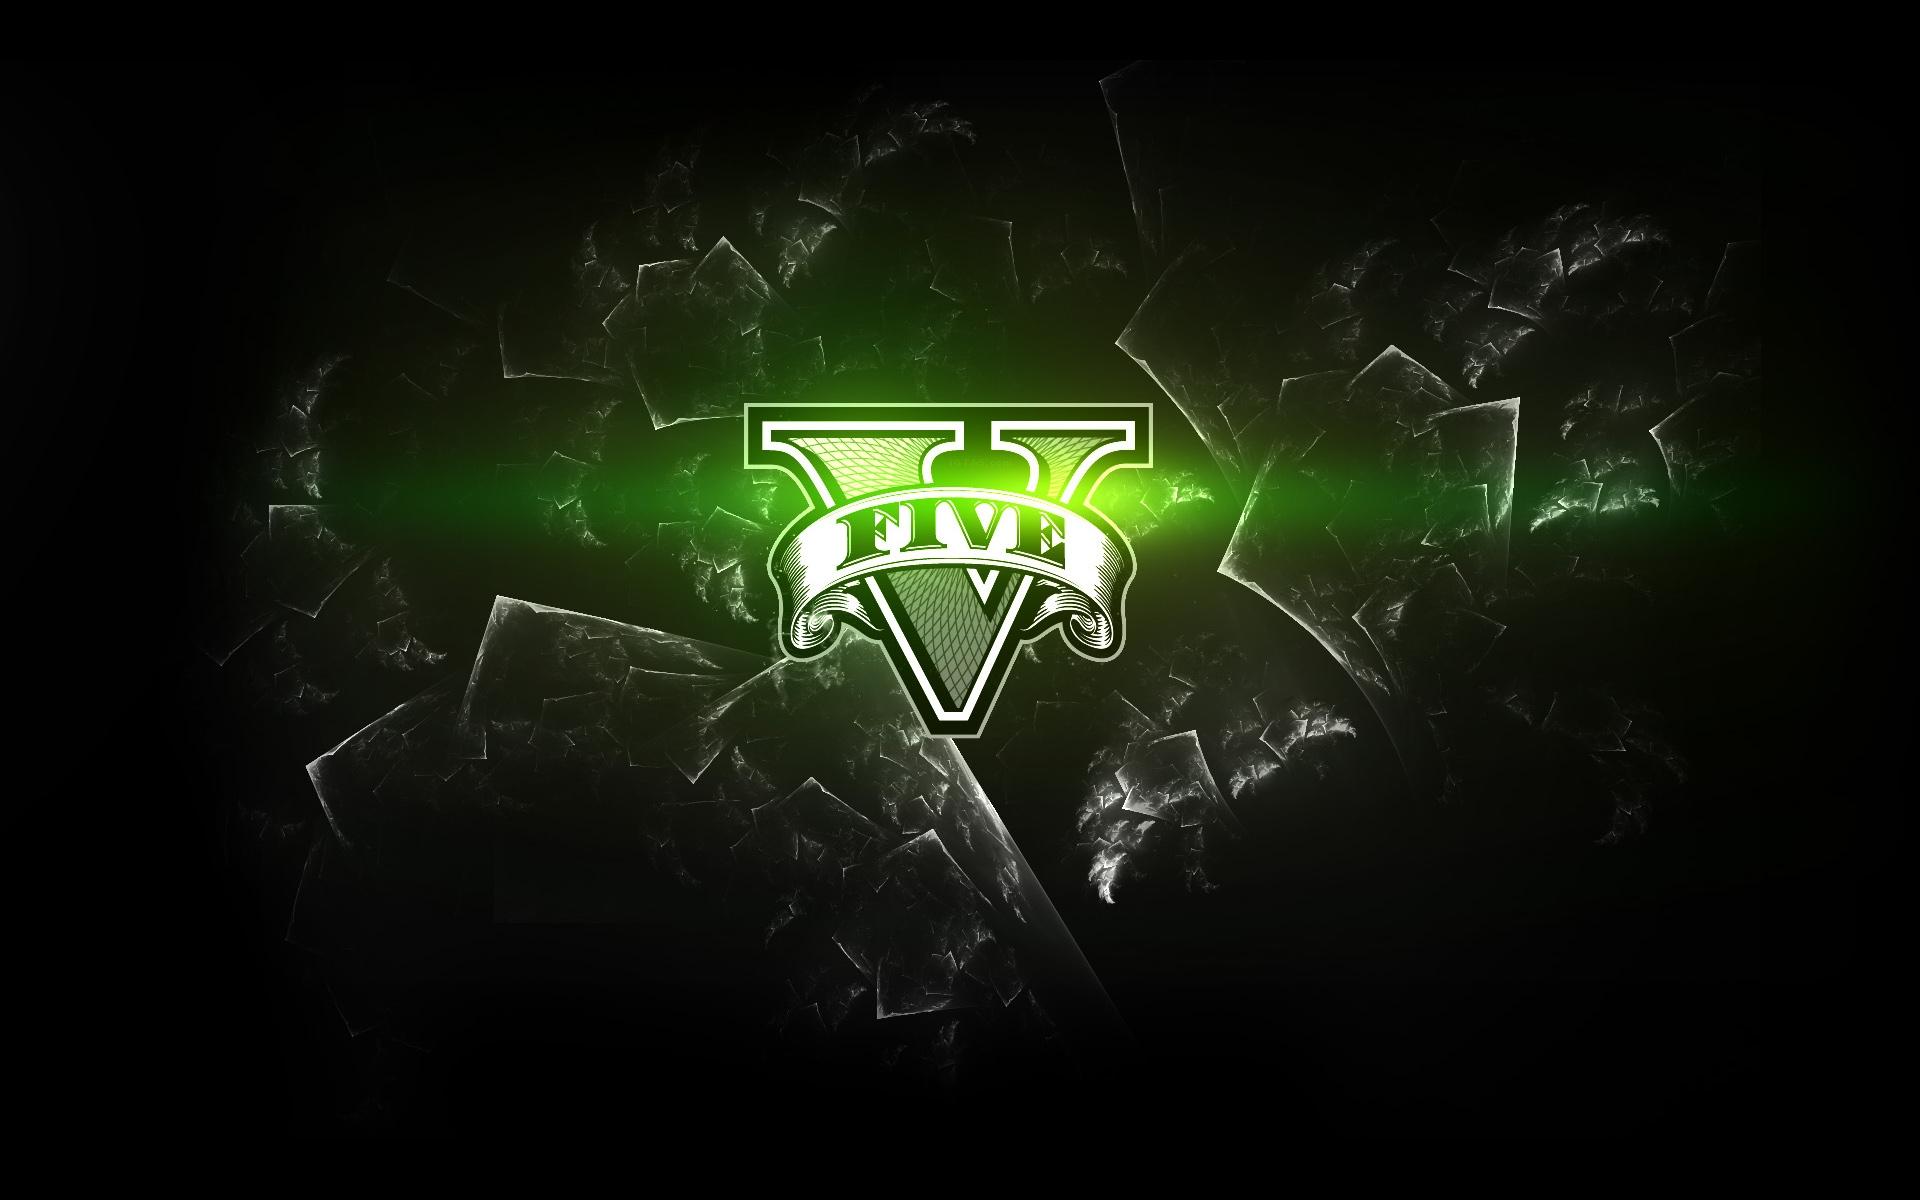 GTA V Wallpaper HD - WallpaperSafari